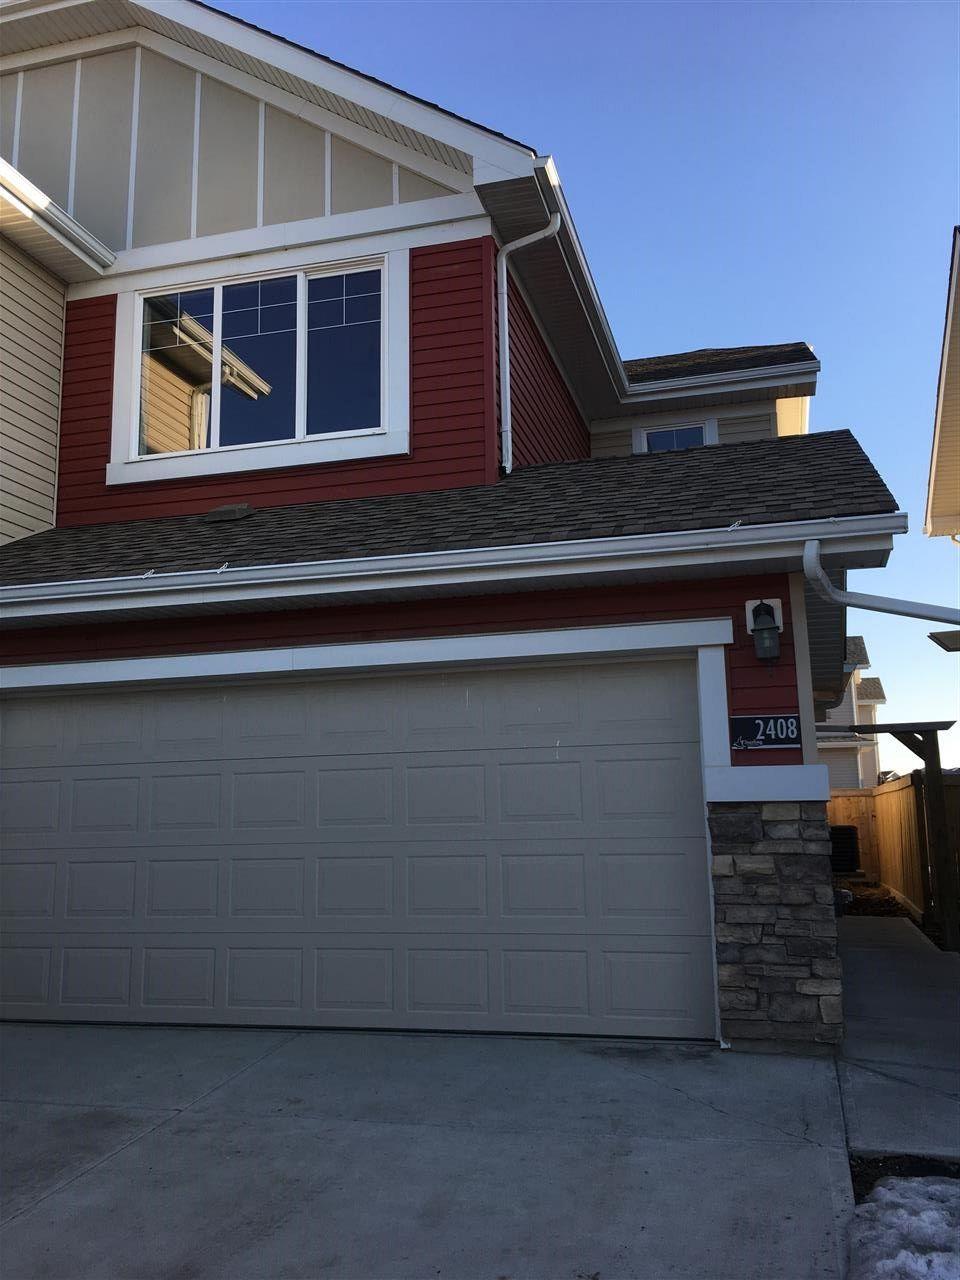 Main Photo: 2408 SPARROW Crescent in Edmonton: Zone 59 House Half Duplex for sale : MLS®# E4143277